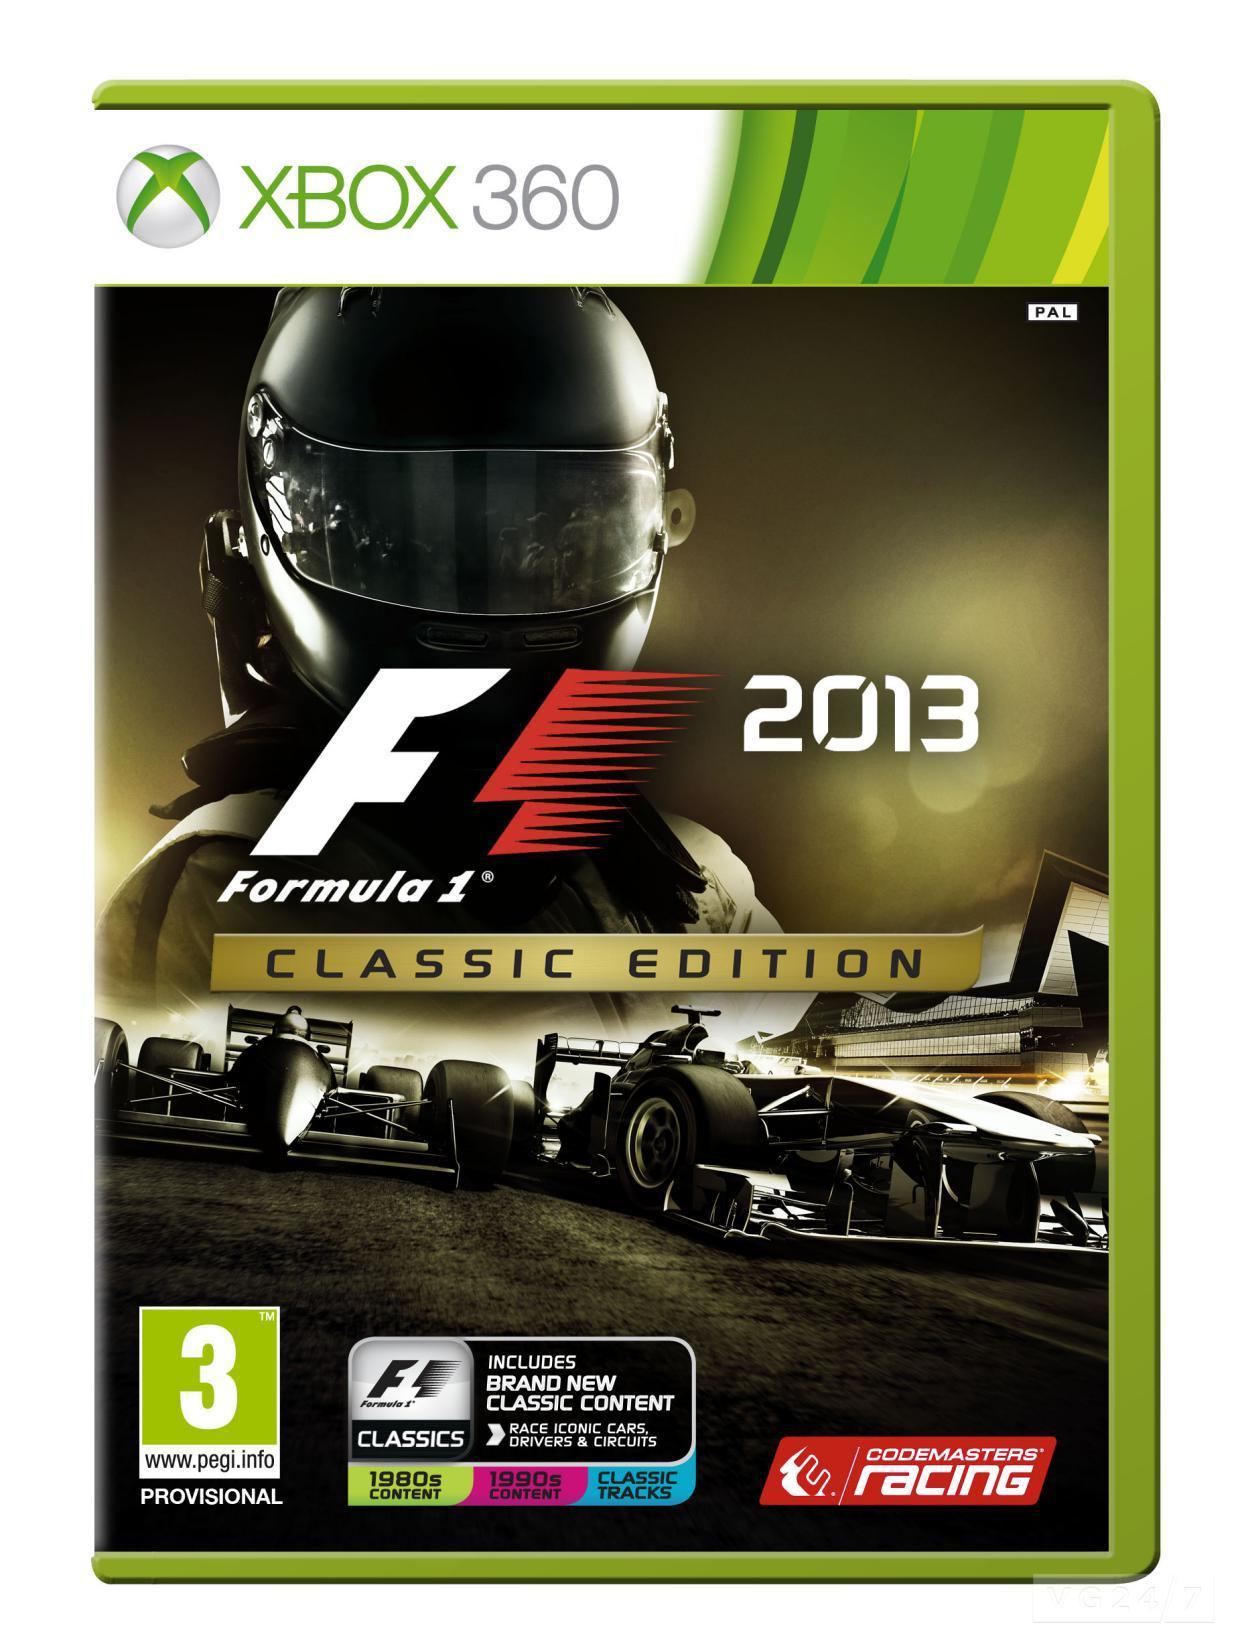 Анонсирован F1 2013: Classic Edition | сервис Онлайн игры анонс Xbox 360